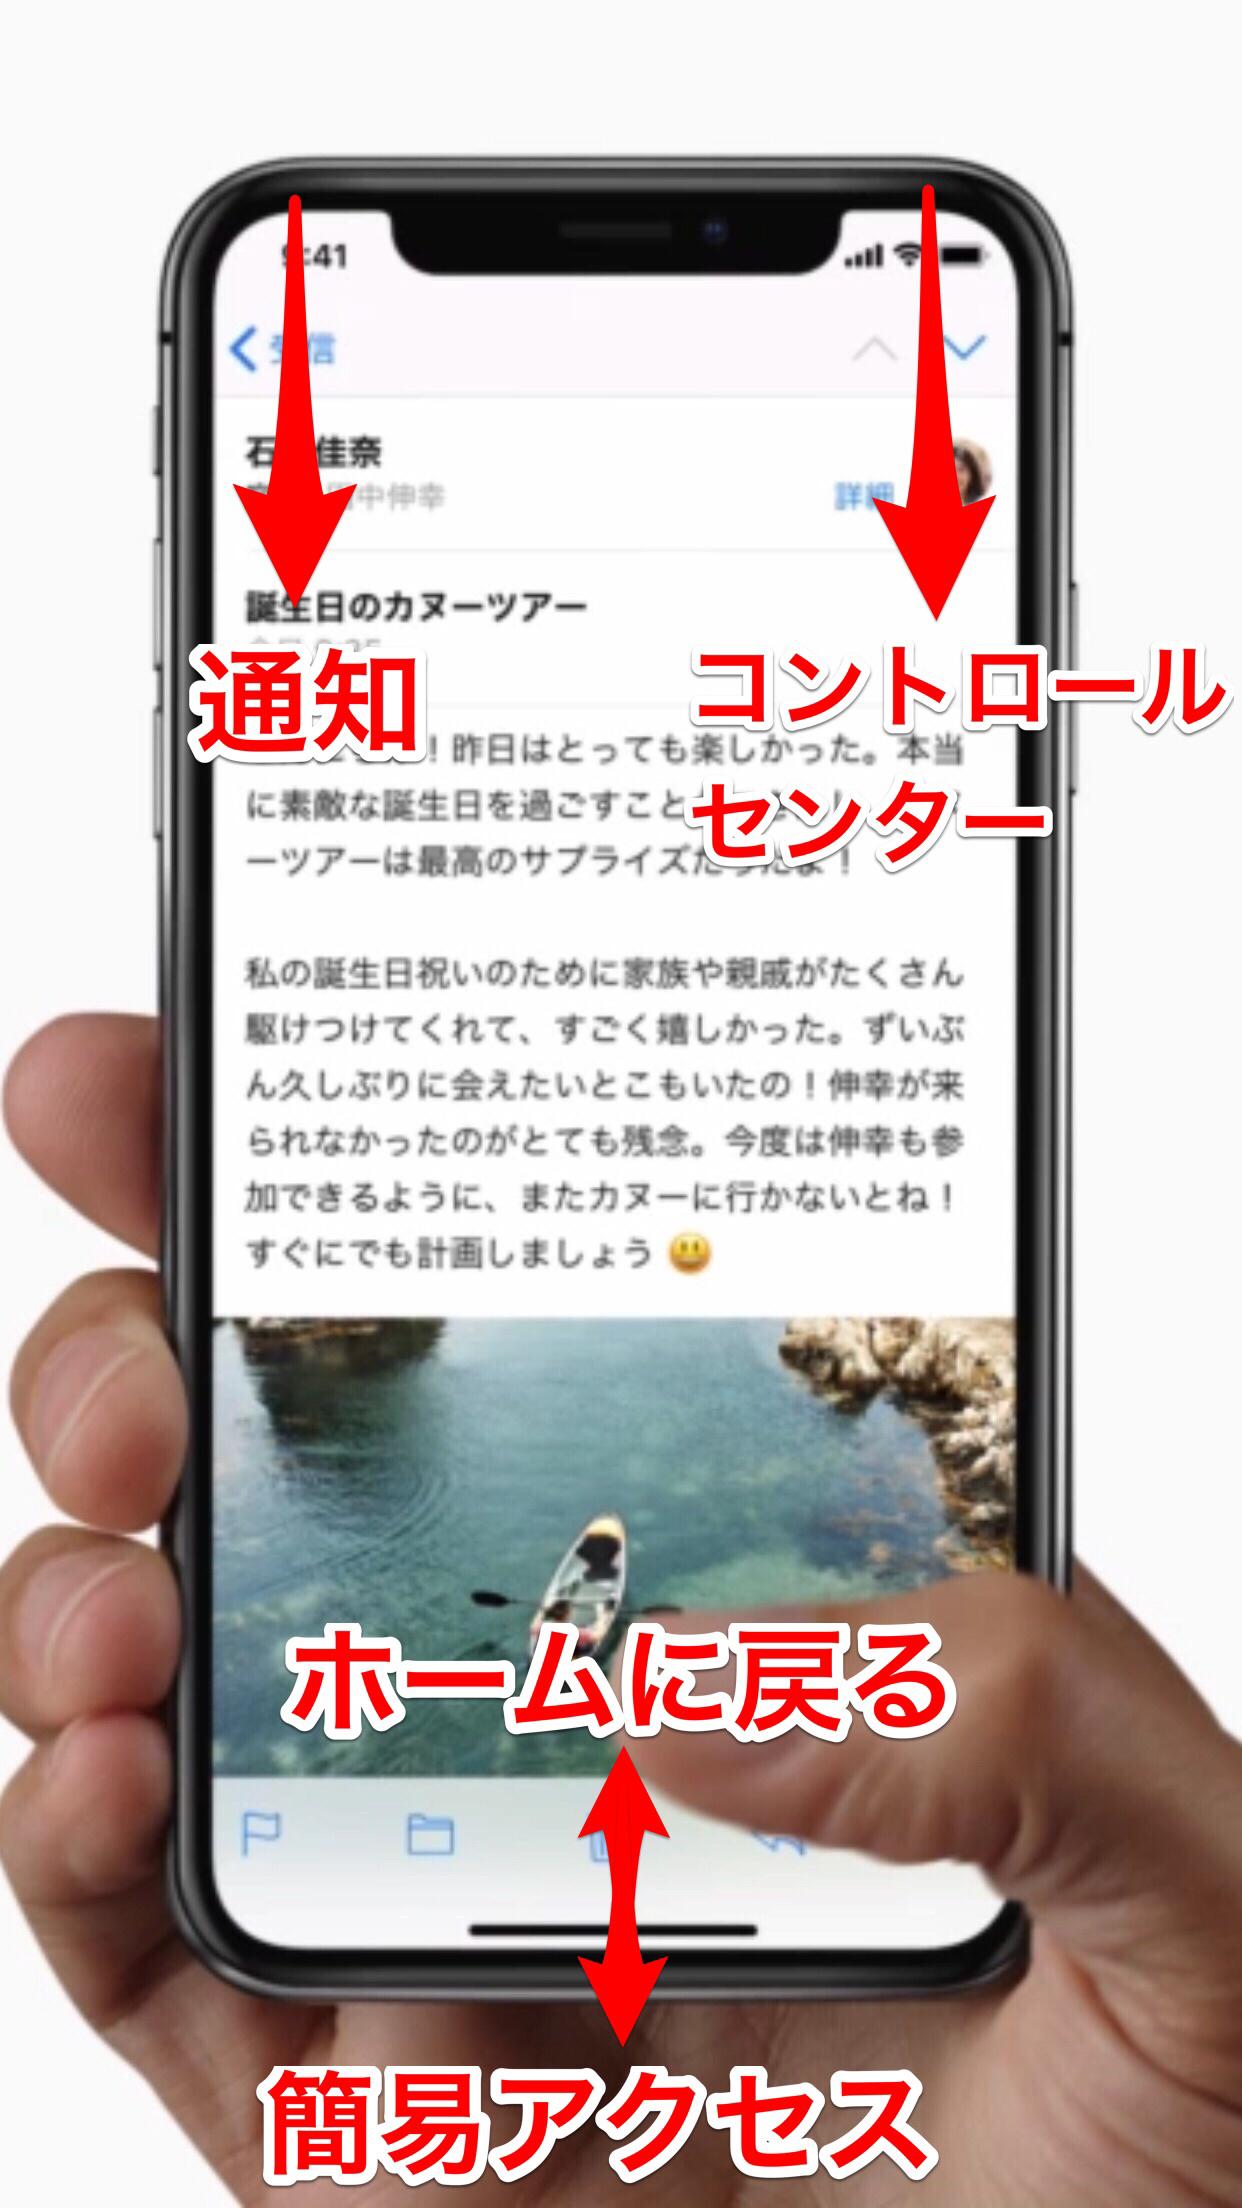 Image+uploaded+from+iOS+%2811%29 - iPhone X、操作変更でケース選びに重大な注意点。